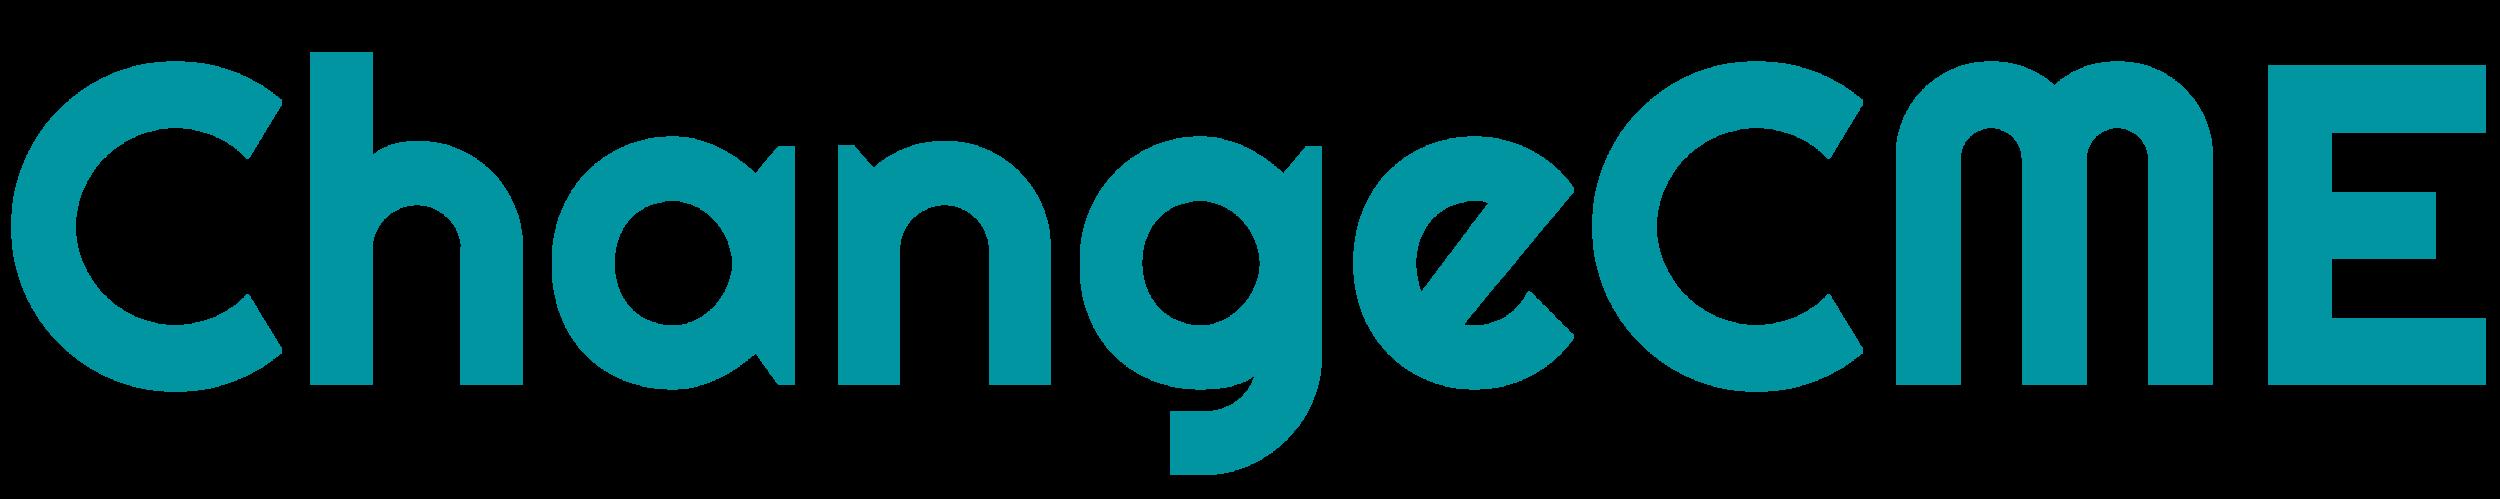 ChangeCME Logo_Green.png